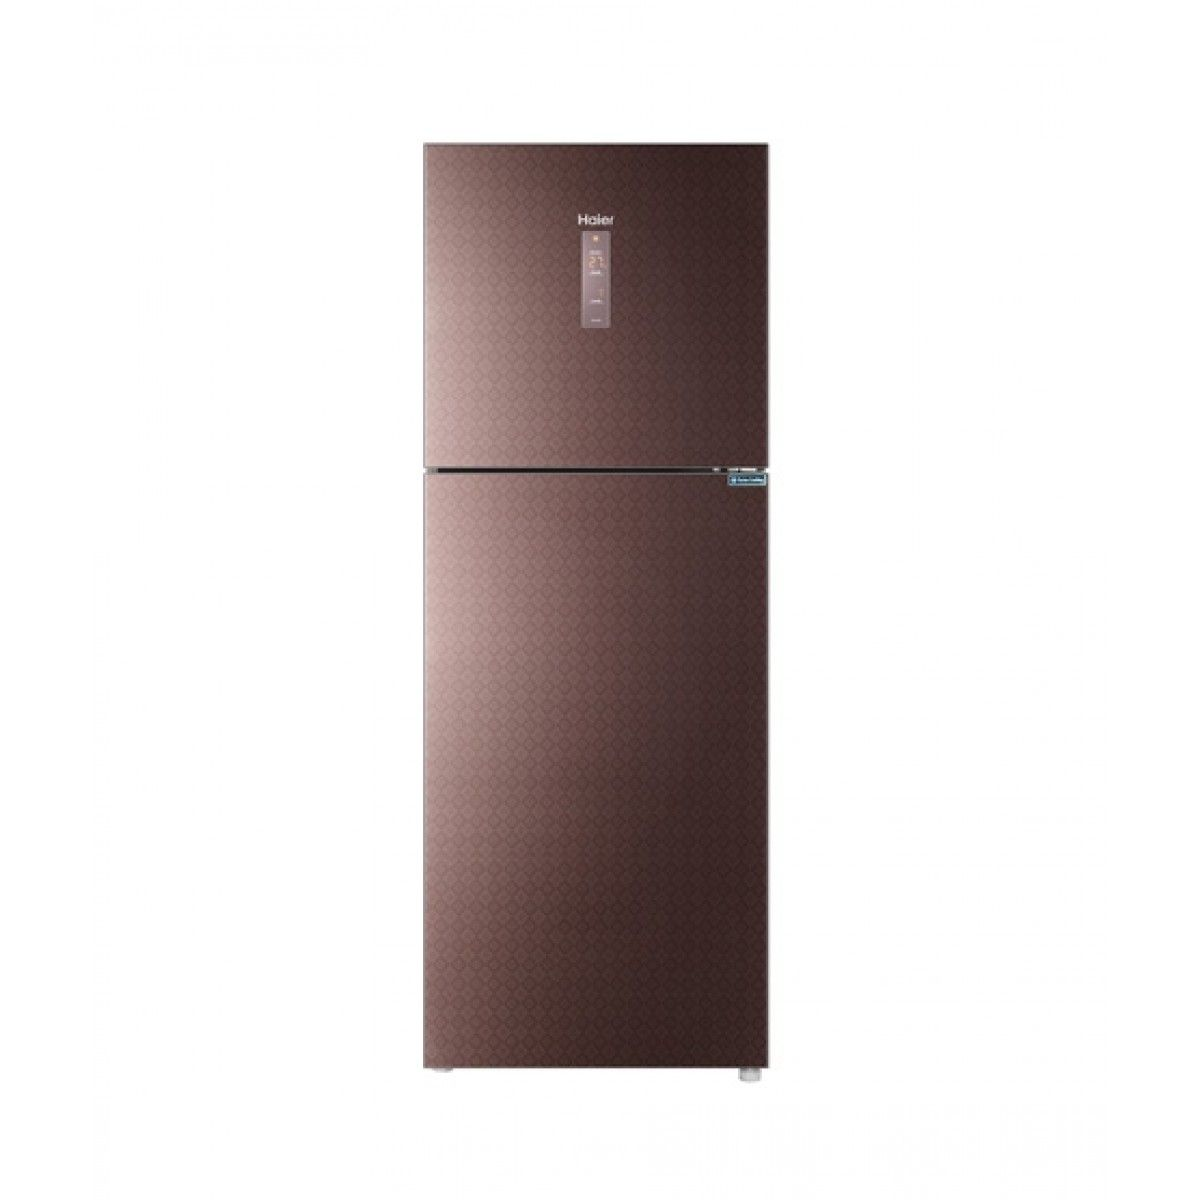 Haier HRF-336TDC 11 Cu Ft Refrigerator